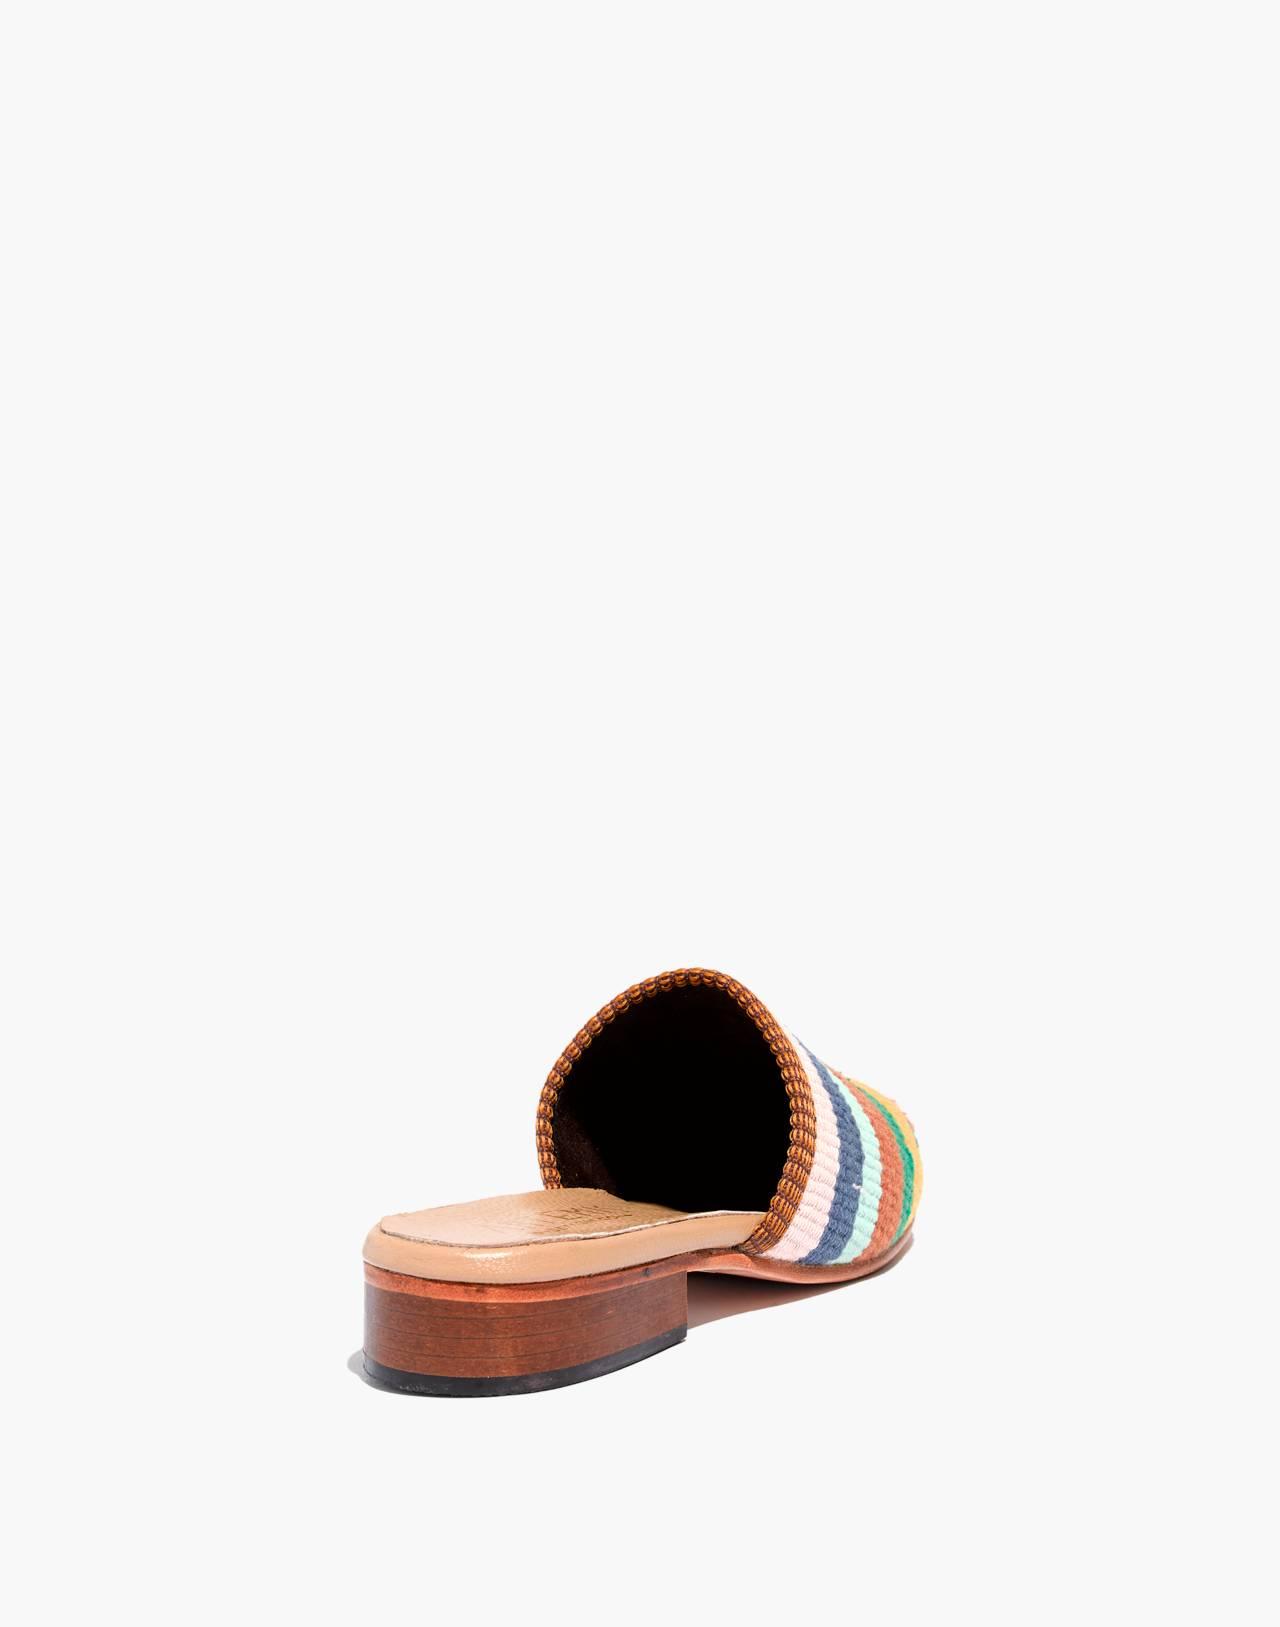 Artemis Design Co. Kilim Slides in bright stripes image 3